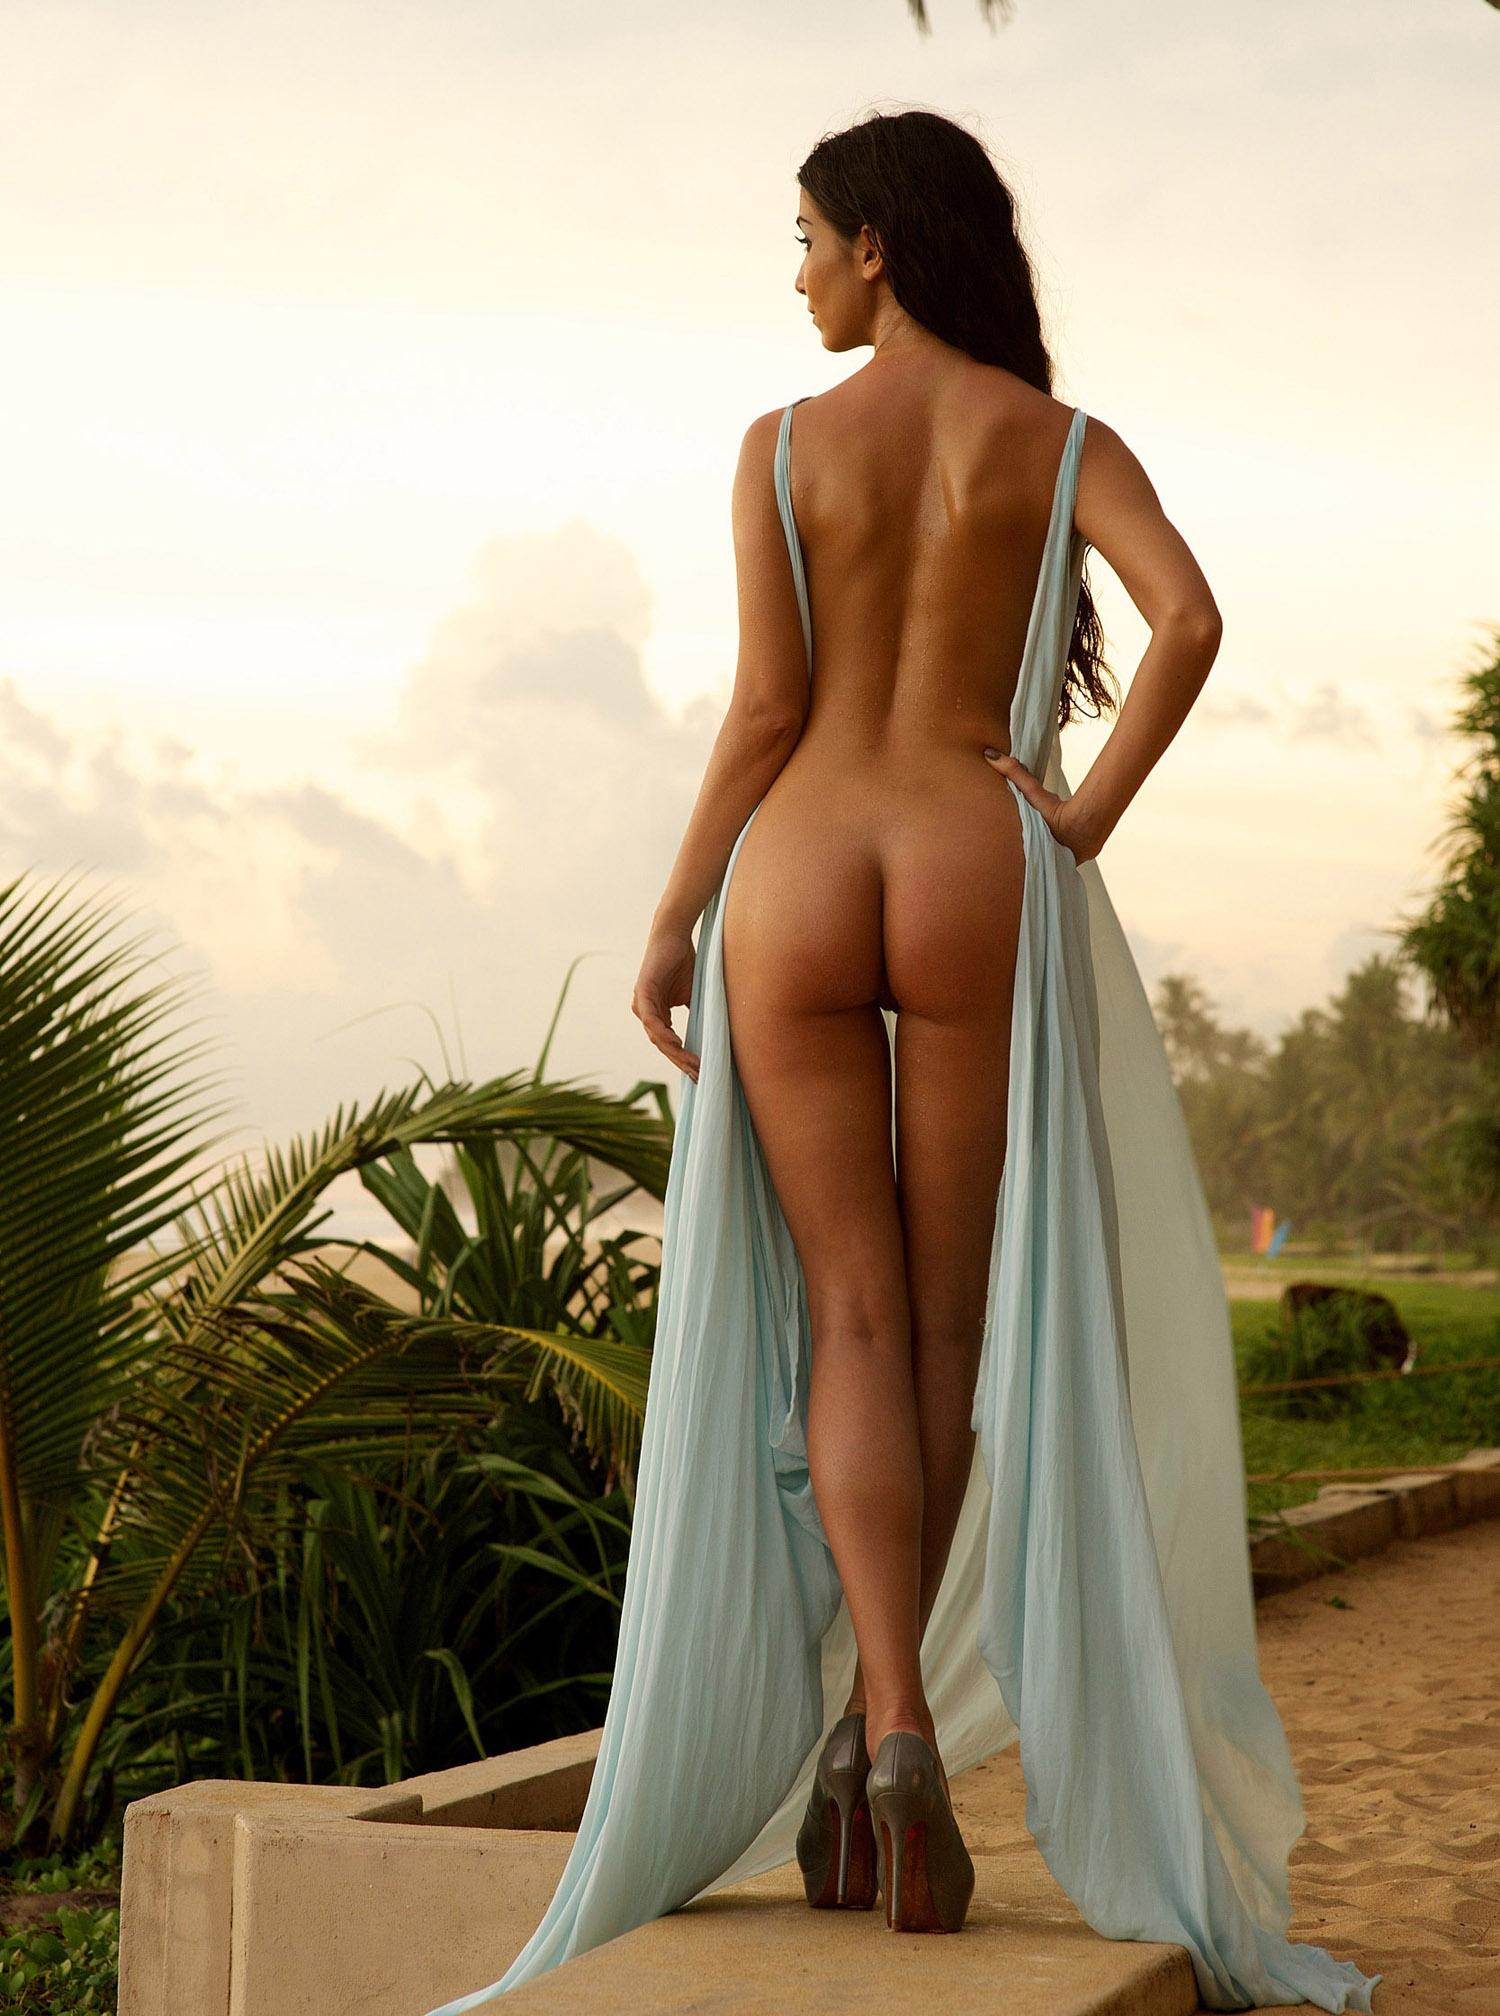 приезали сауну, турецкие эротика фото заметил